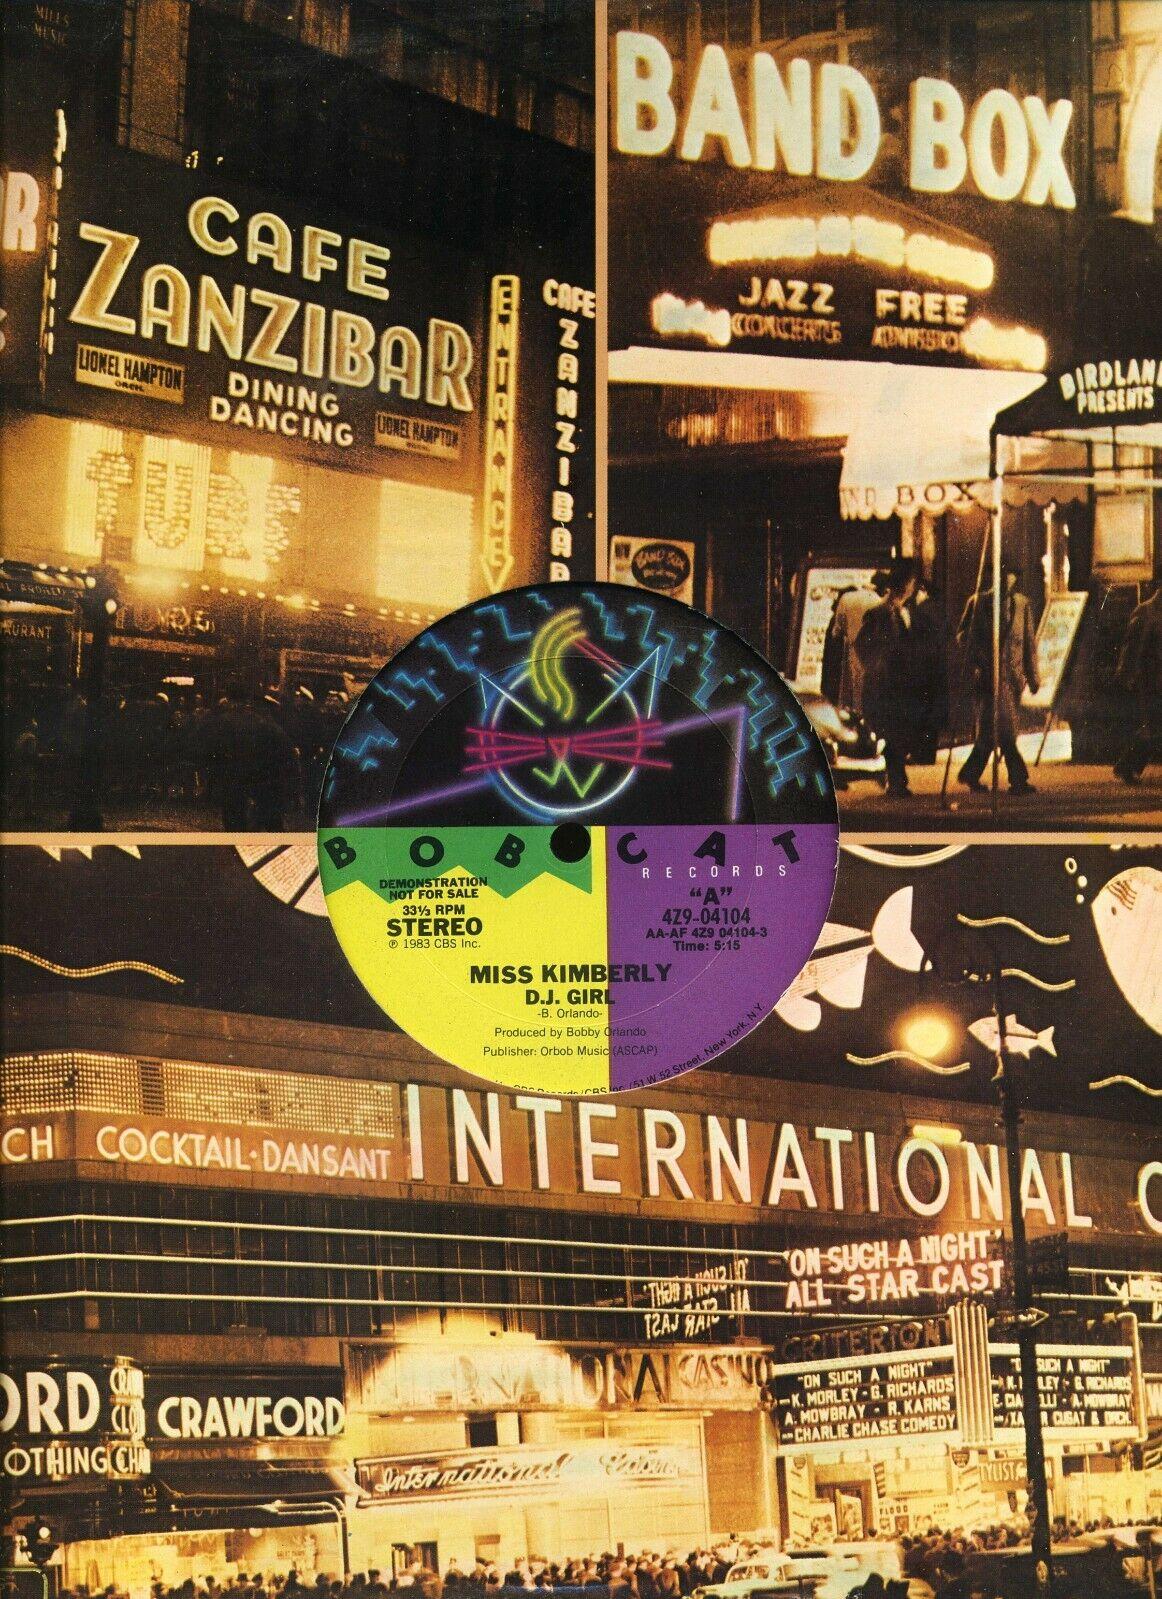 MISS KIMBERLY DJ Girl BOBCAT US 12-inch PROMO NM Bobby Orlando HiNRG - $4.99